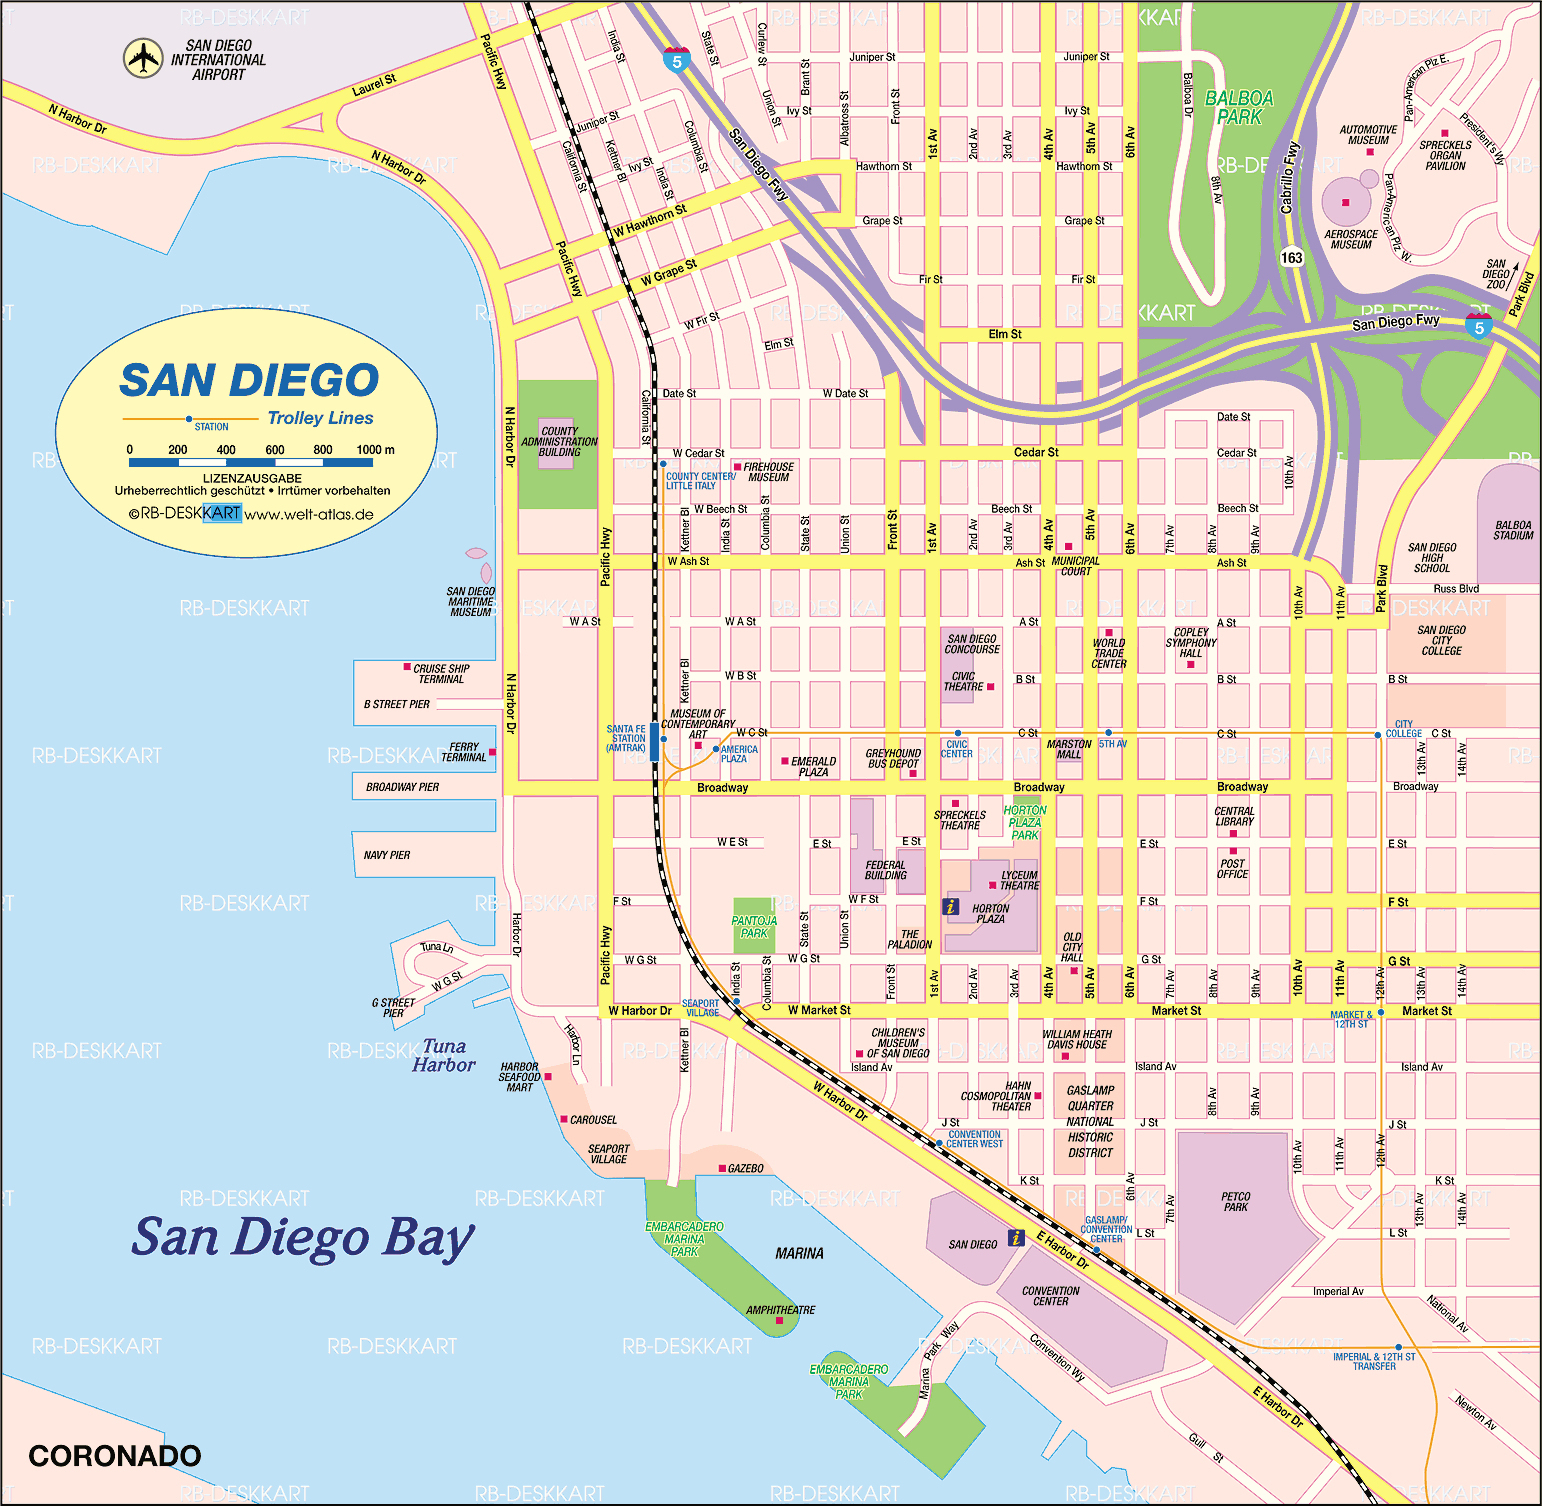 Atlas Plan De San Diego California State Map West Covina California - West Covina California Map